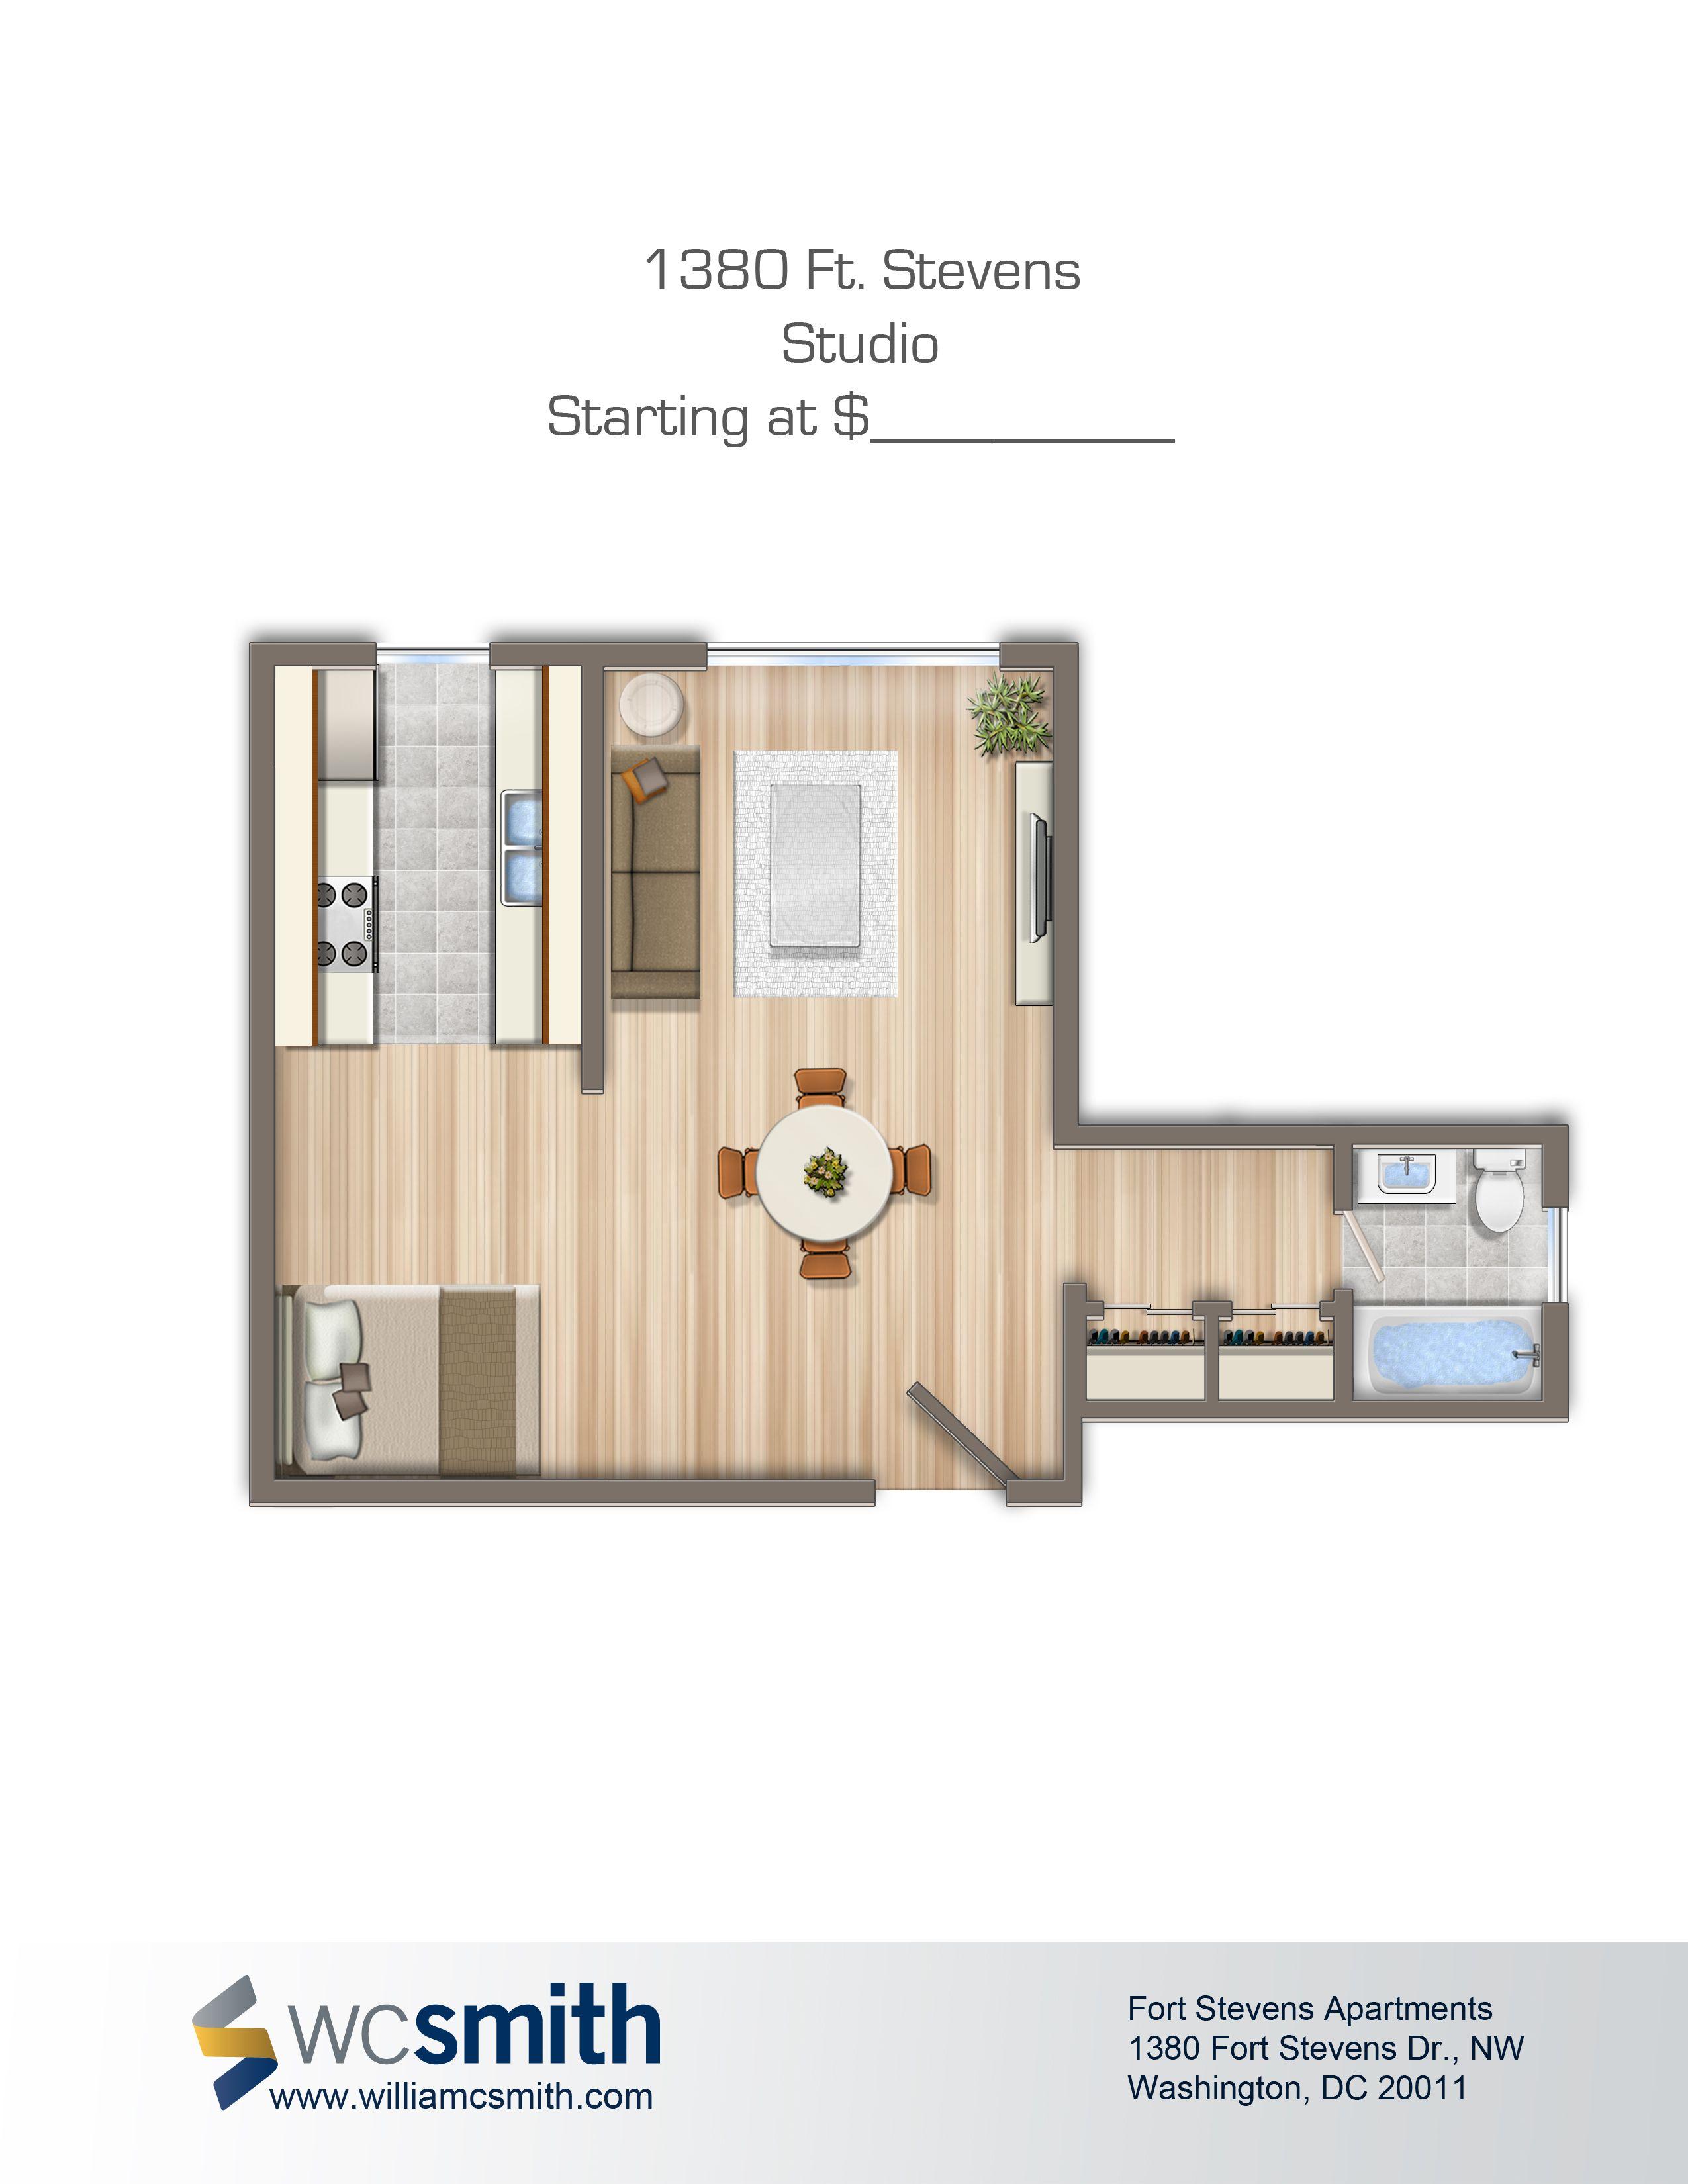 Studio Efficiency Floor Plan 1380 Ft Stevens Apartments In Northwest Washington Dc Wc Smith Apartments Dc Apartments Washington Dc Apartment Apartment